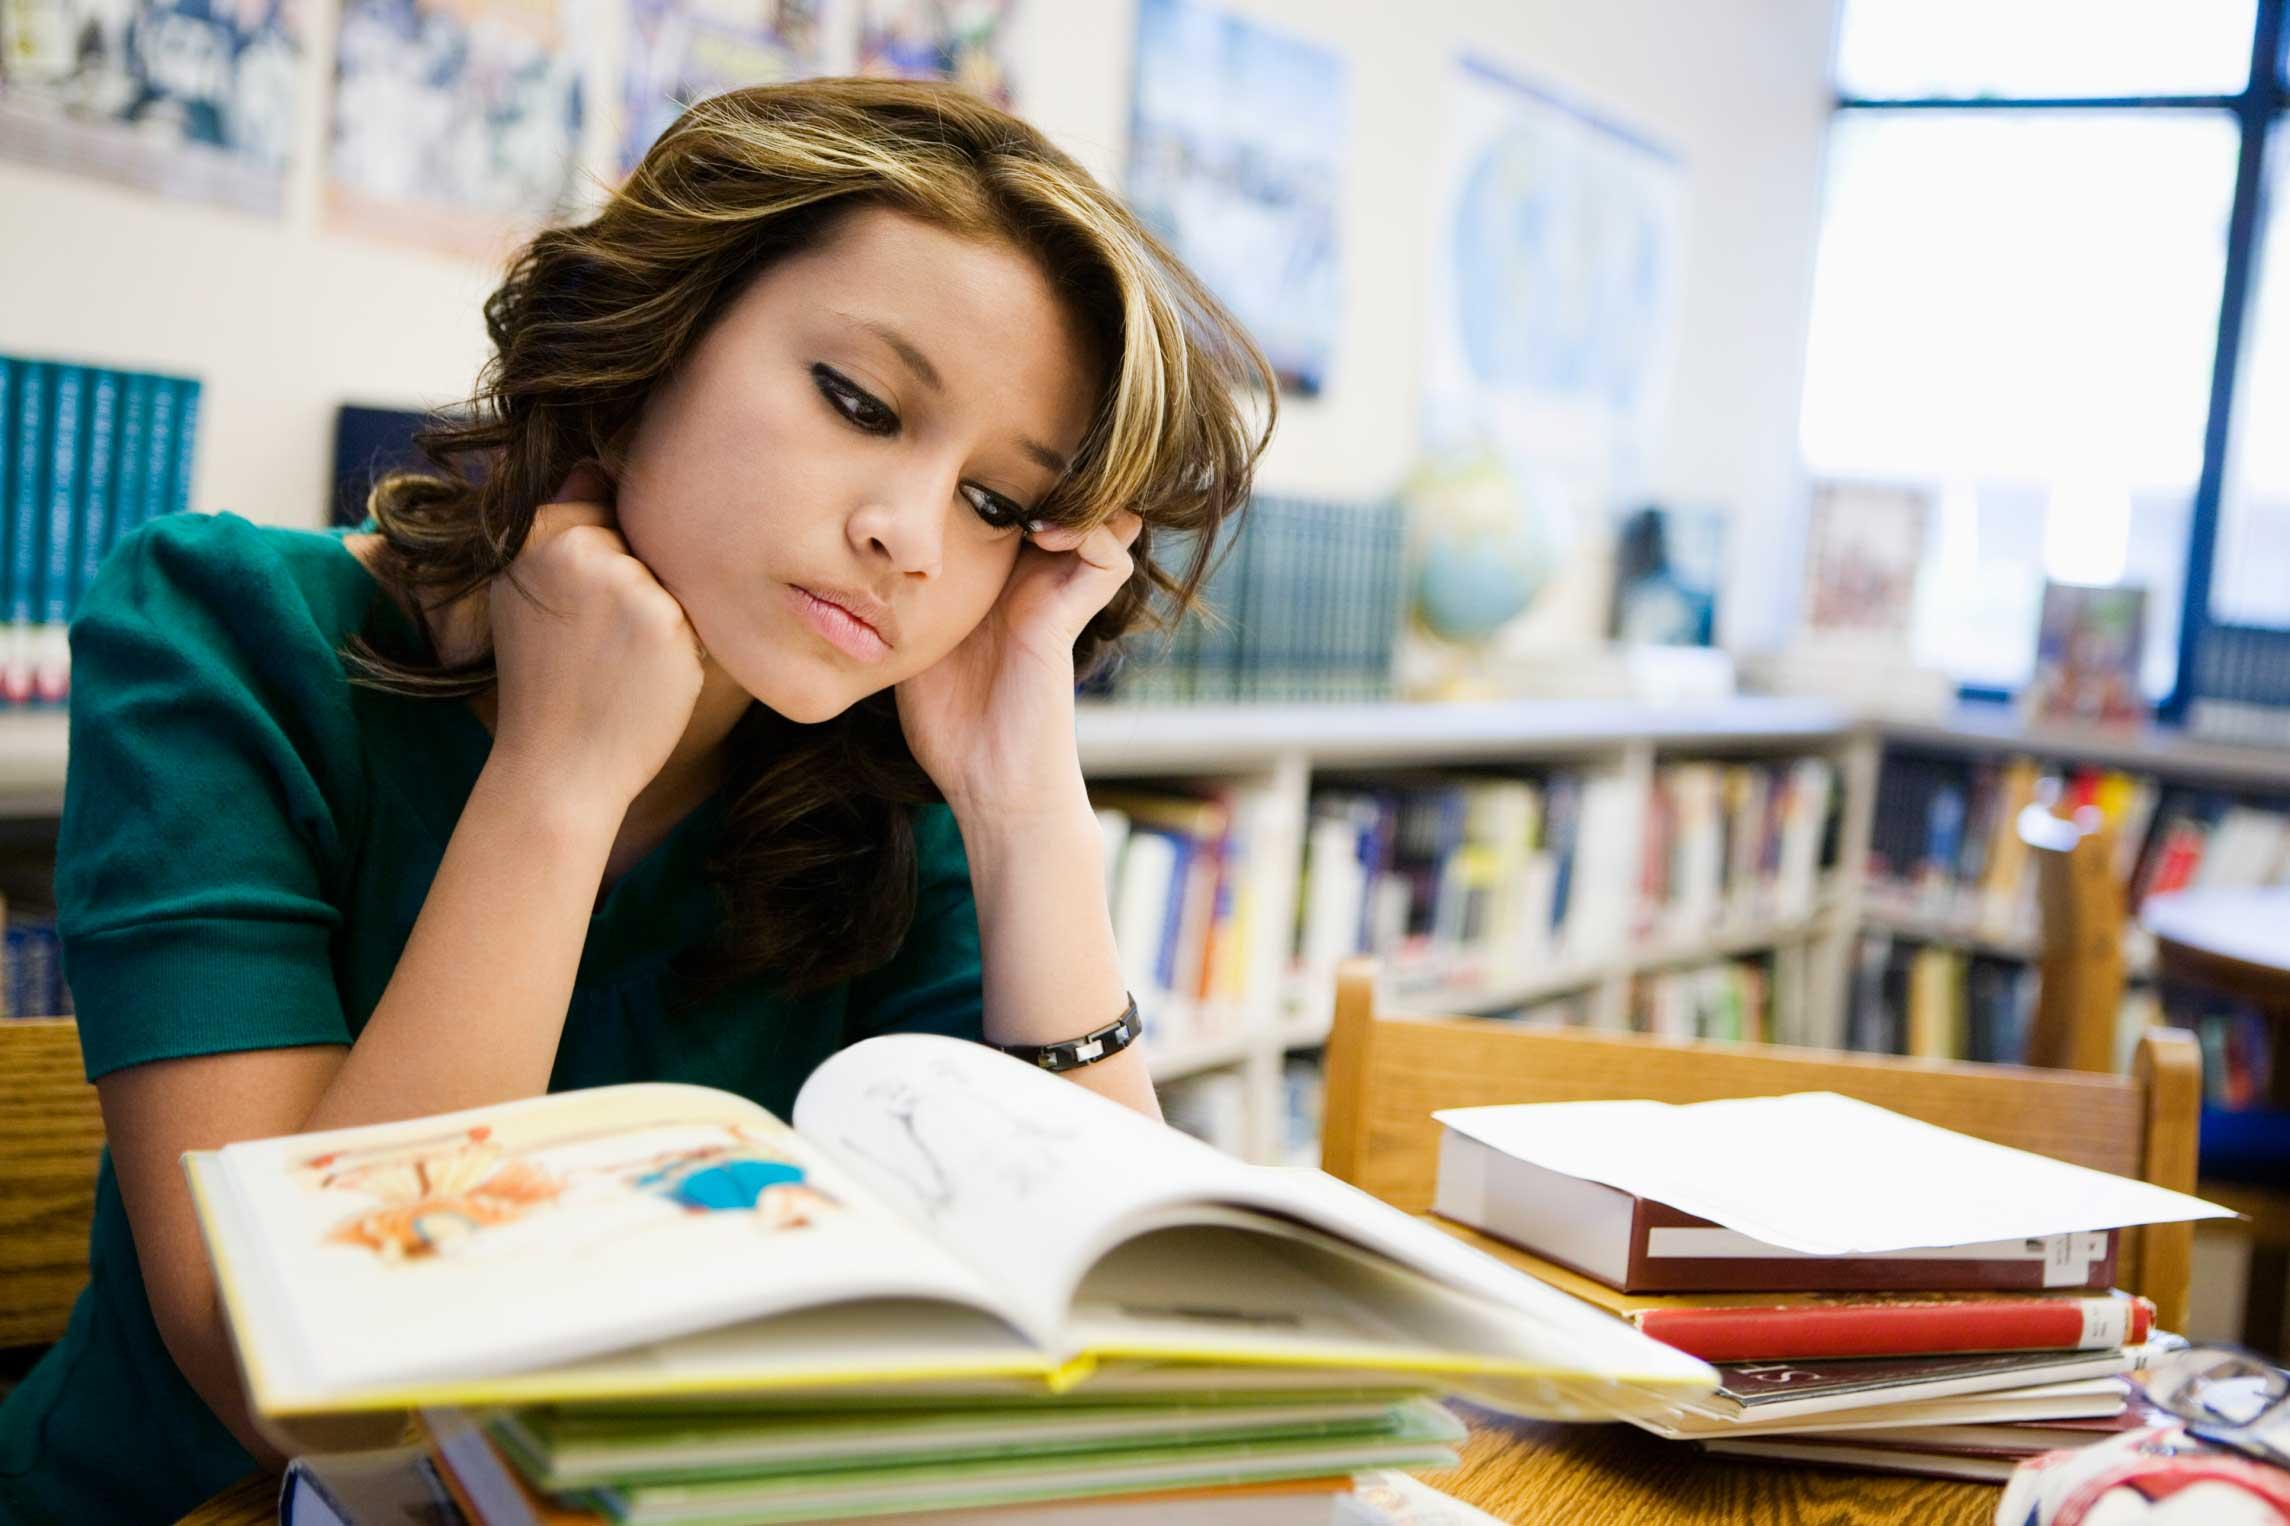 Homework help for high school